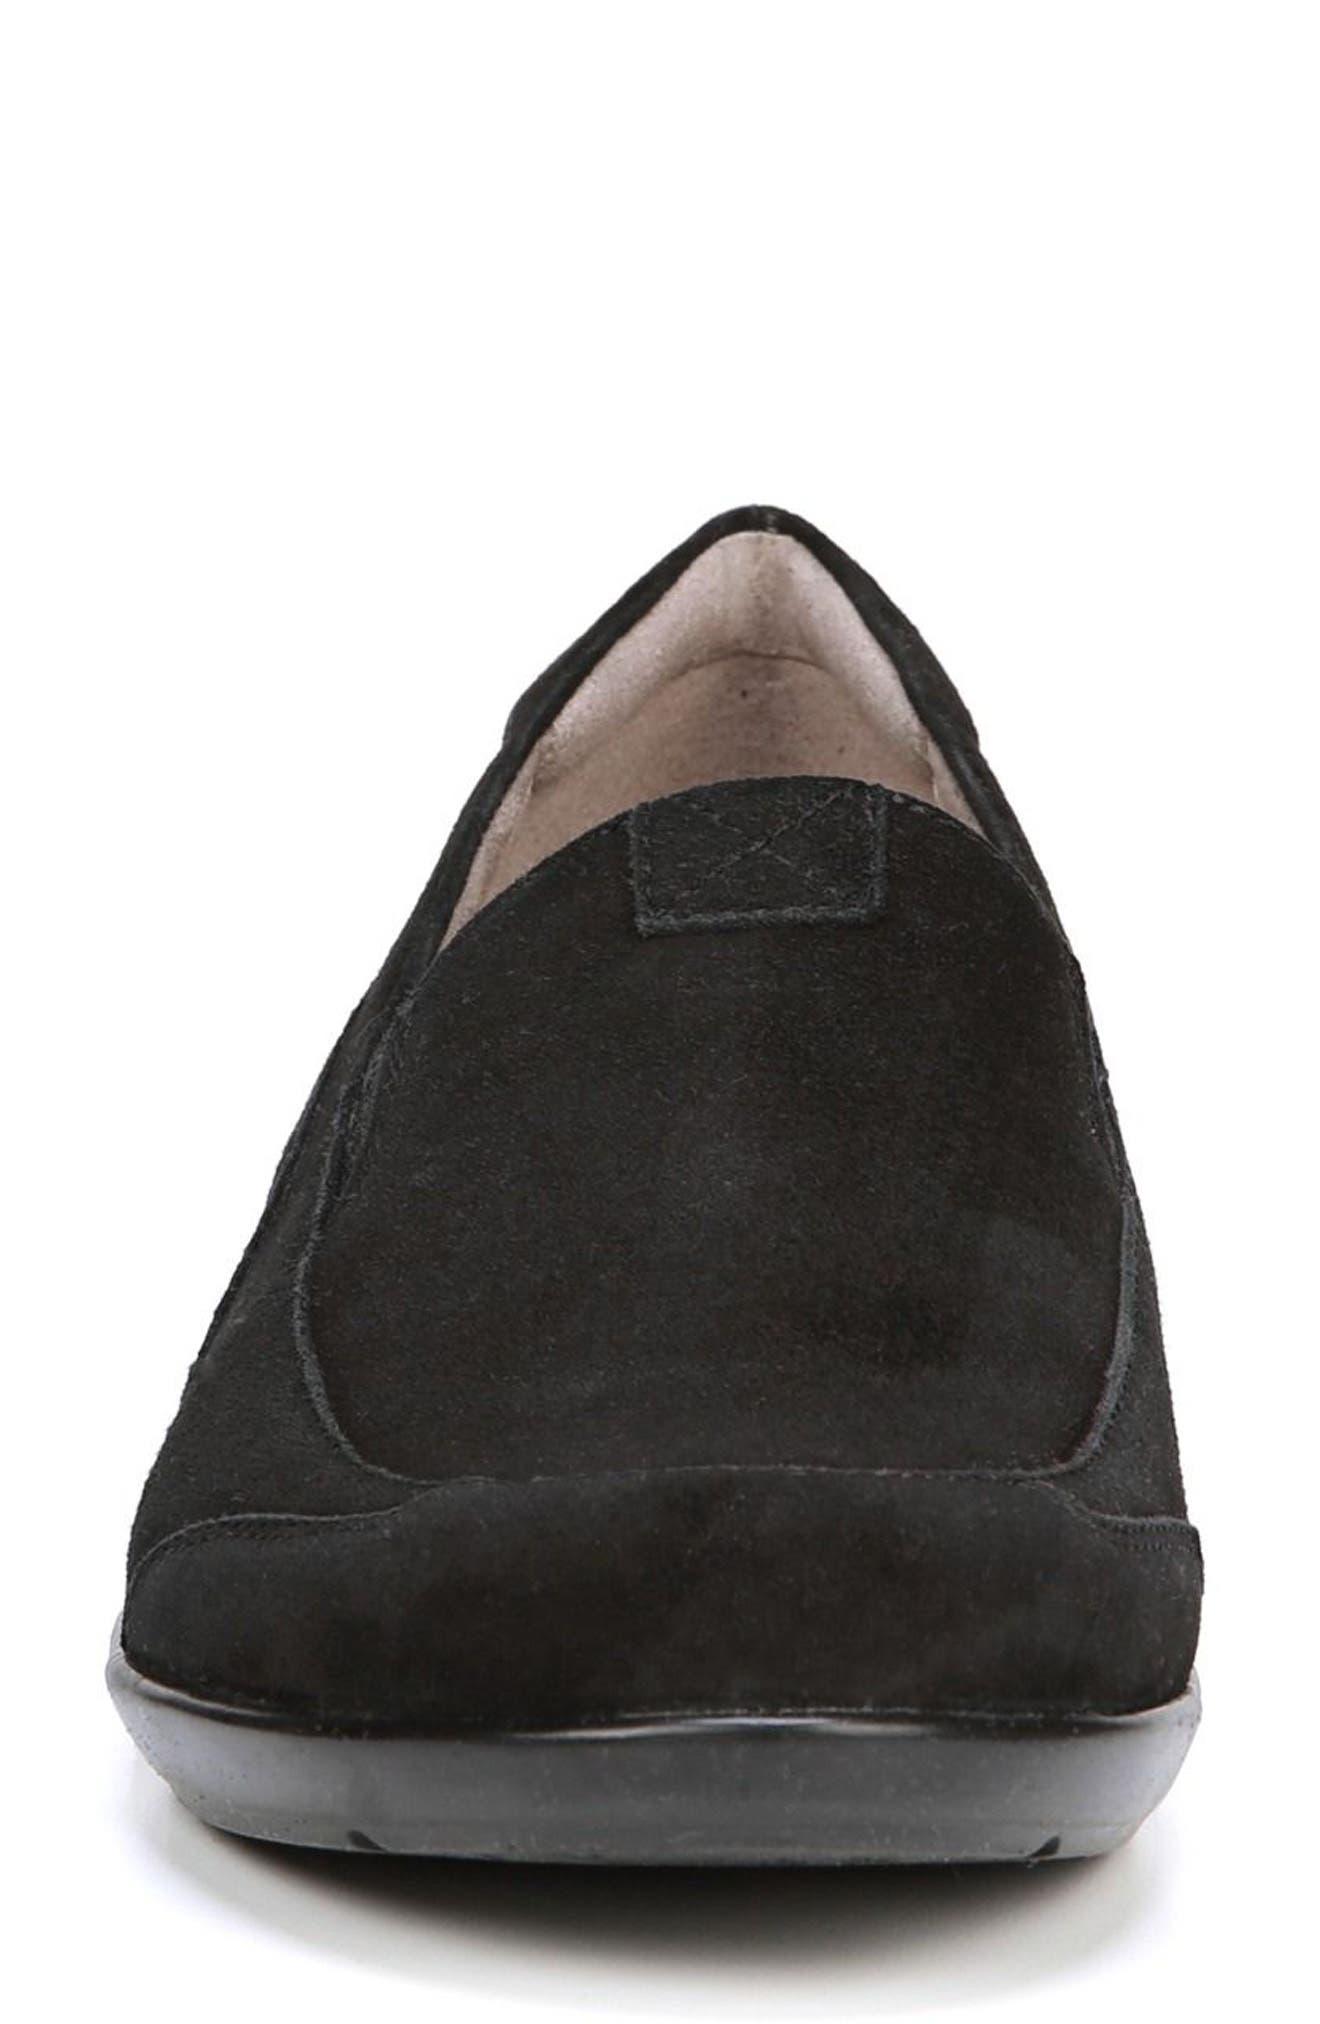 'Channing' Loafer,                             Alternate thumbnail 4, color,                             BLACK SUEDE